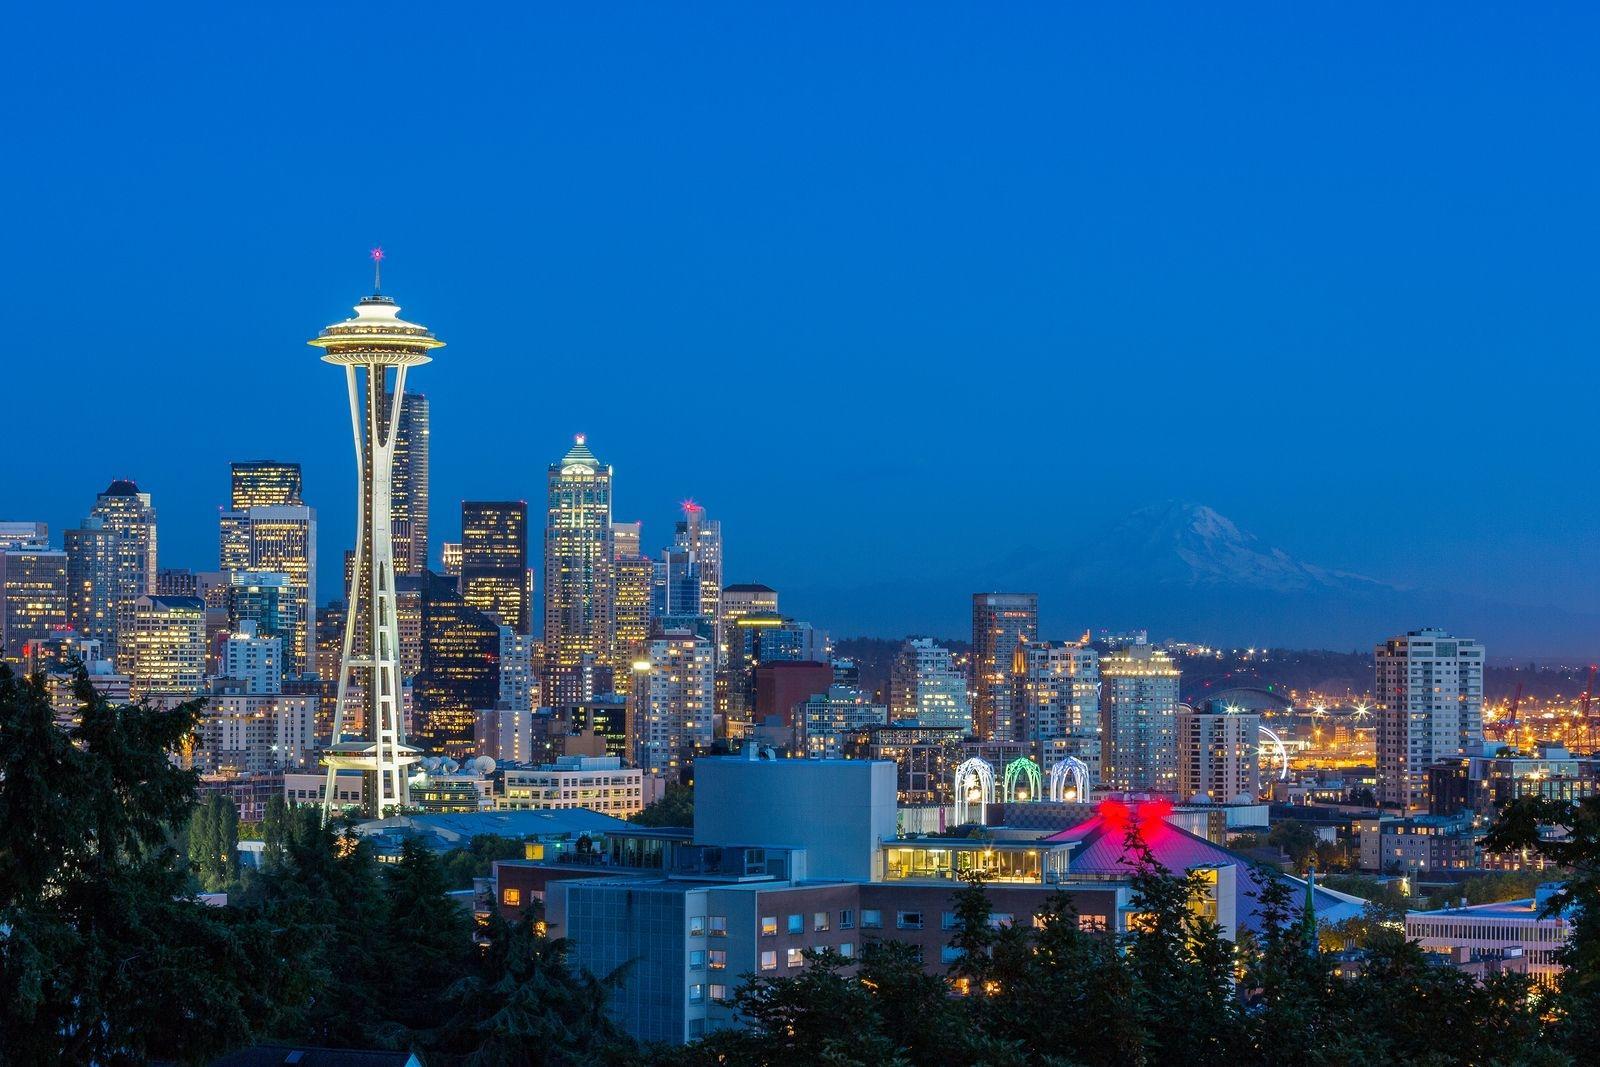 Seattle skyline at dusk